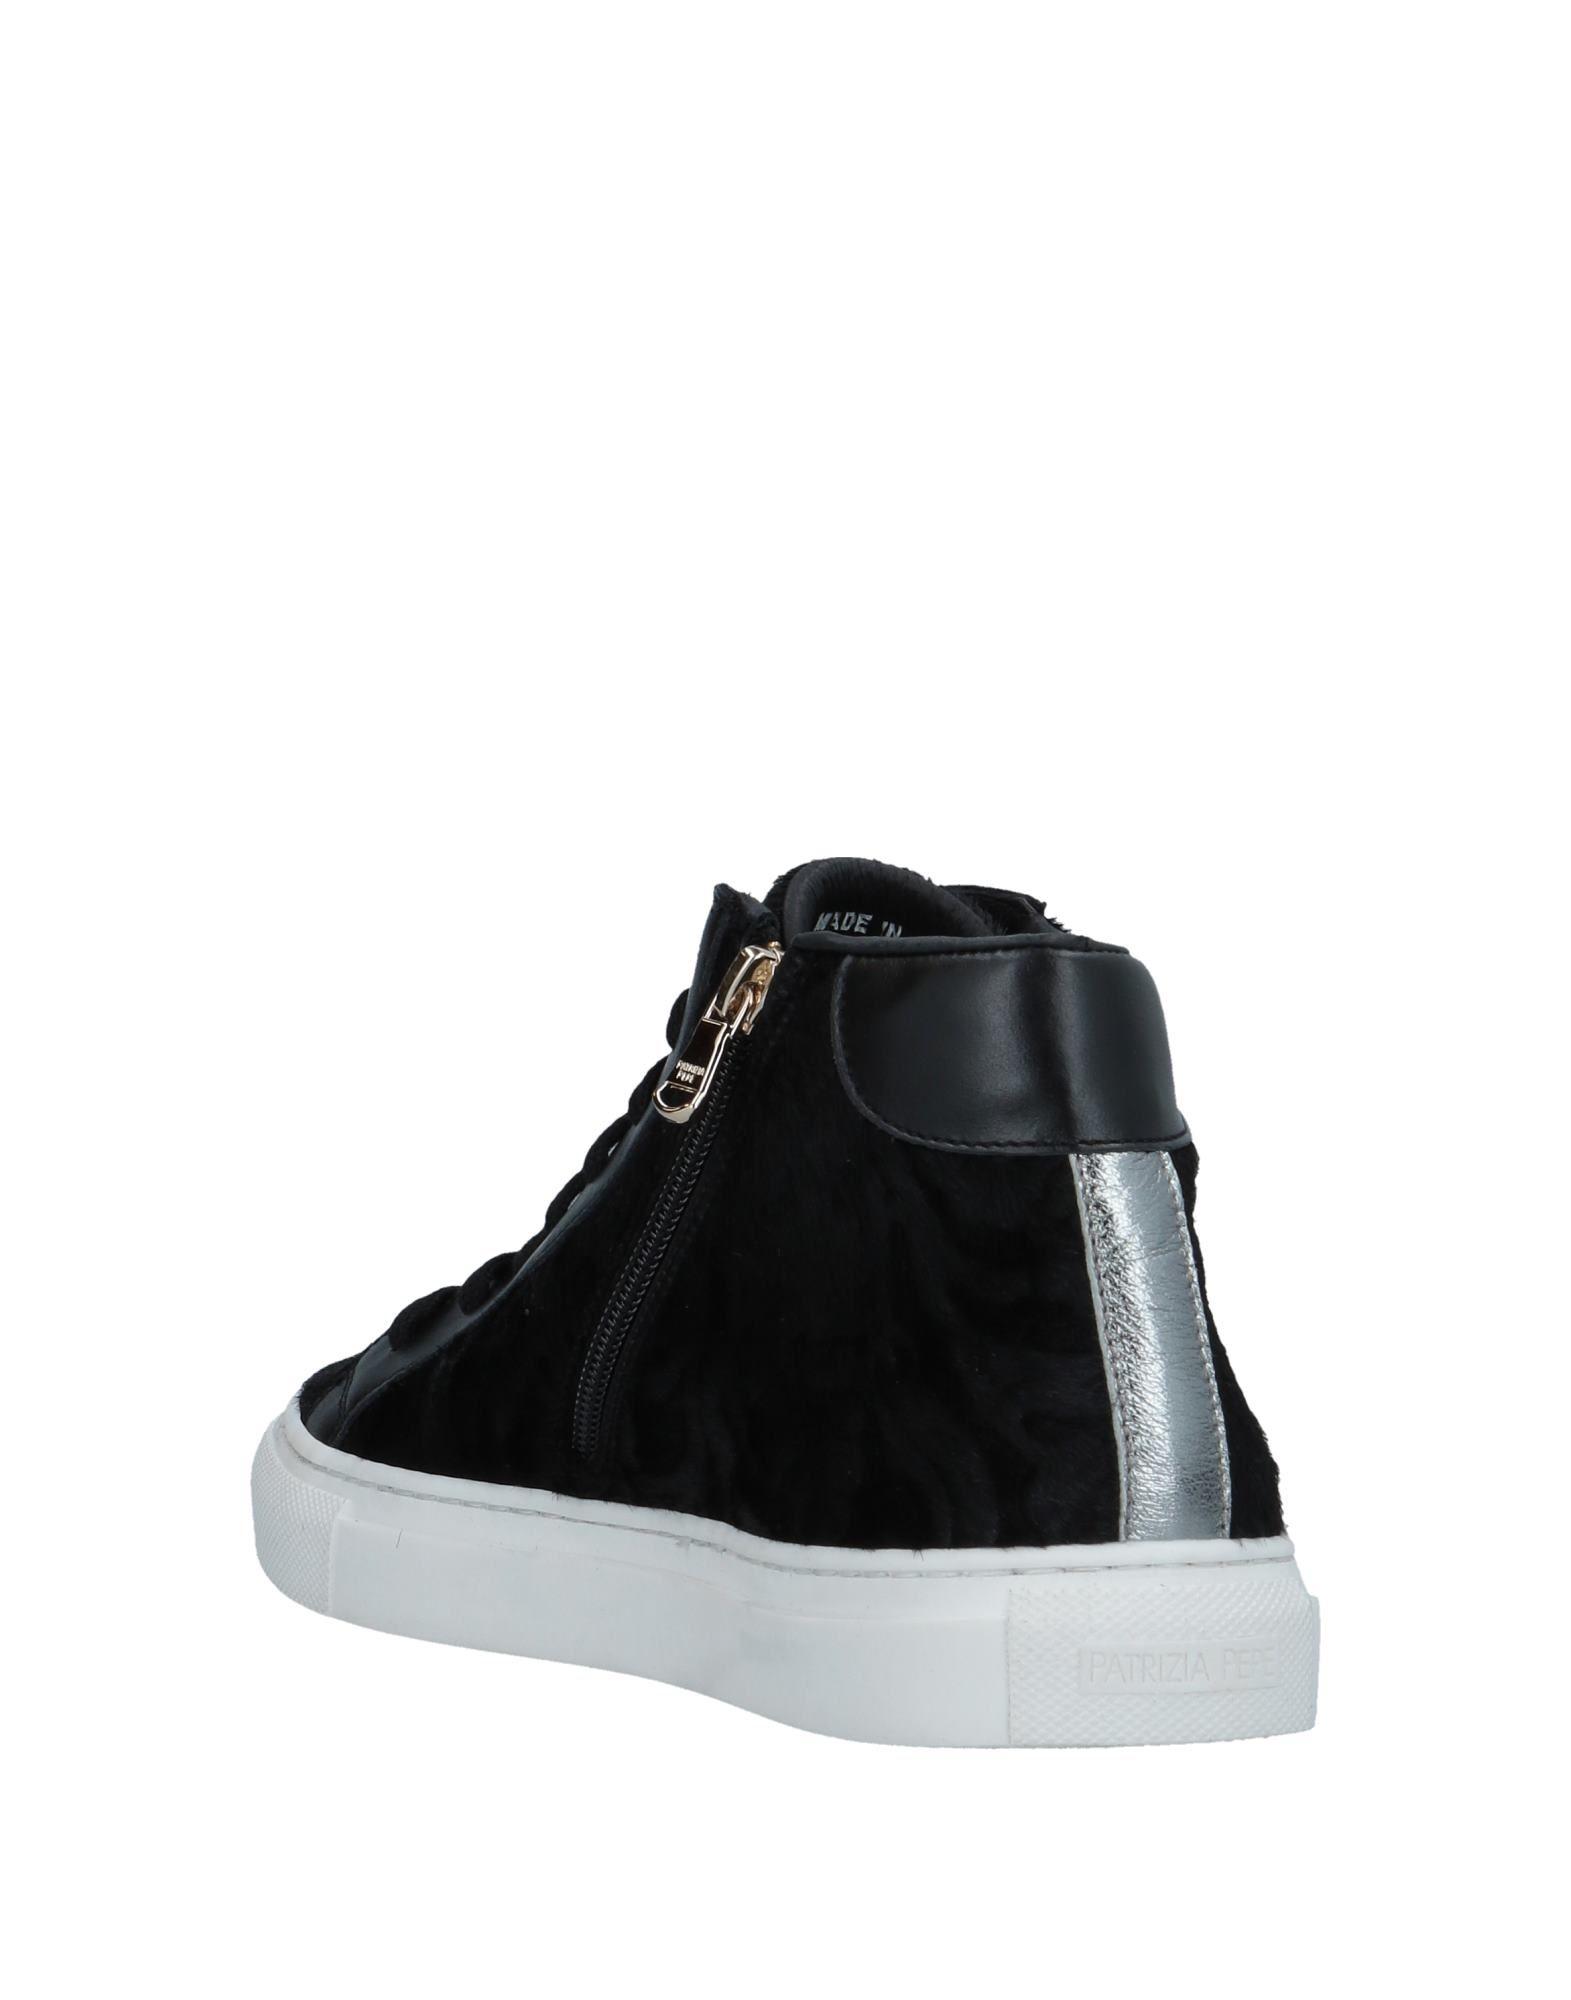 Patrizia Pepe Sneakers Damen  11522925AEGut aussehende Schuhe strapazierfähige Schuhe aussehende ccc076